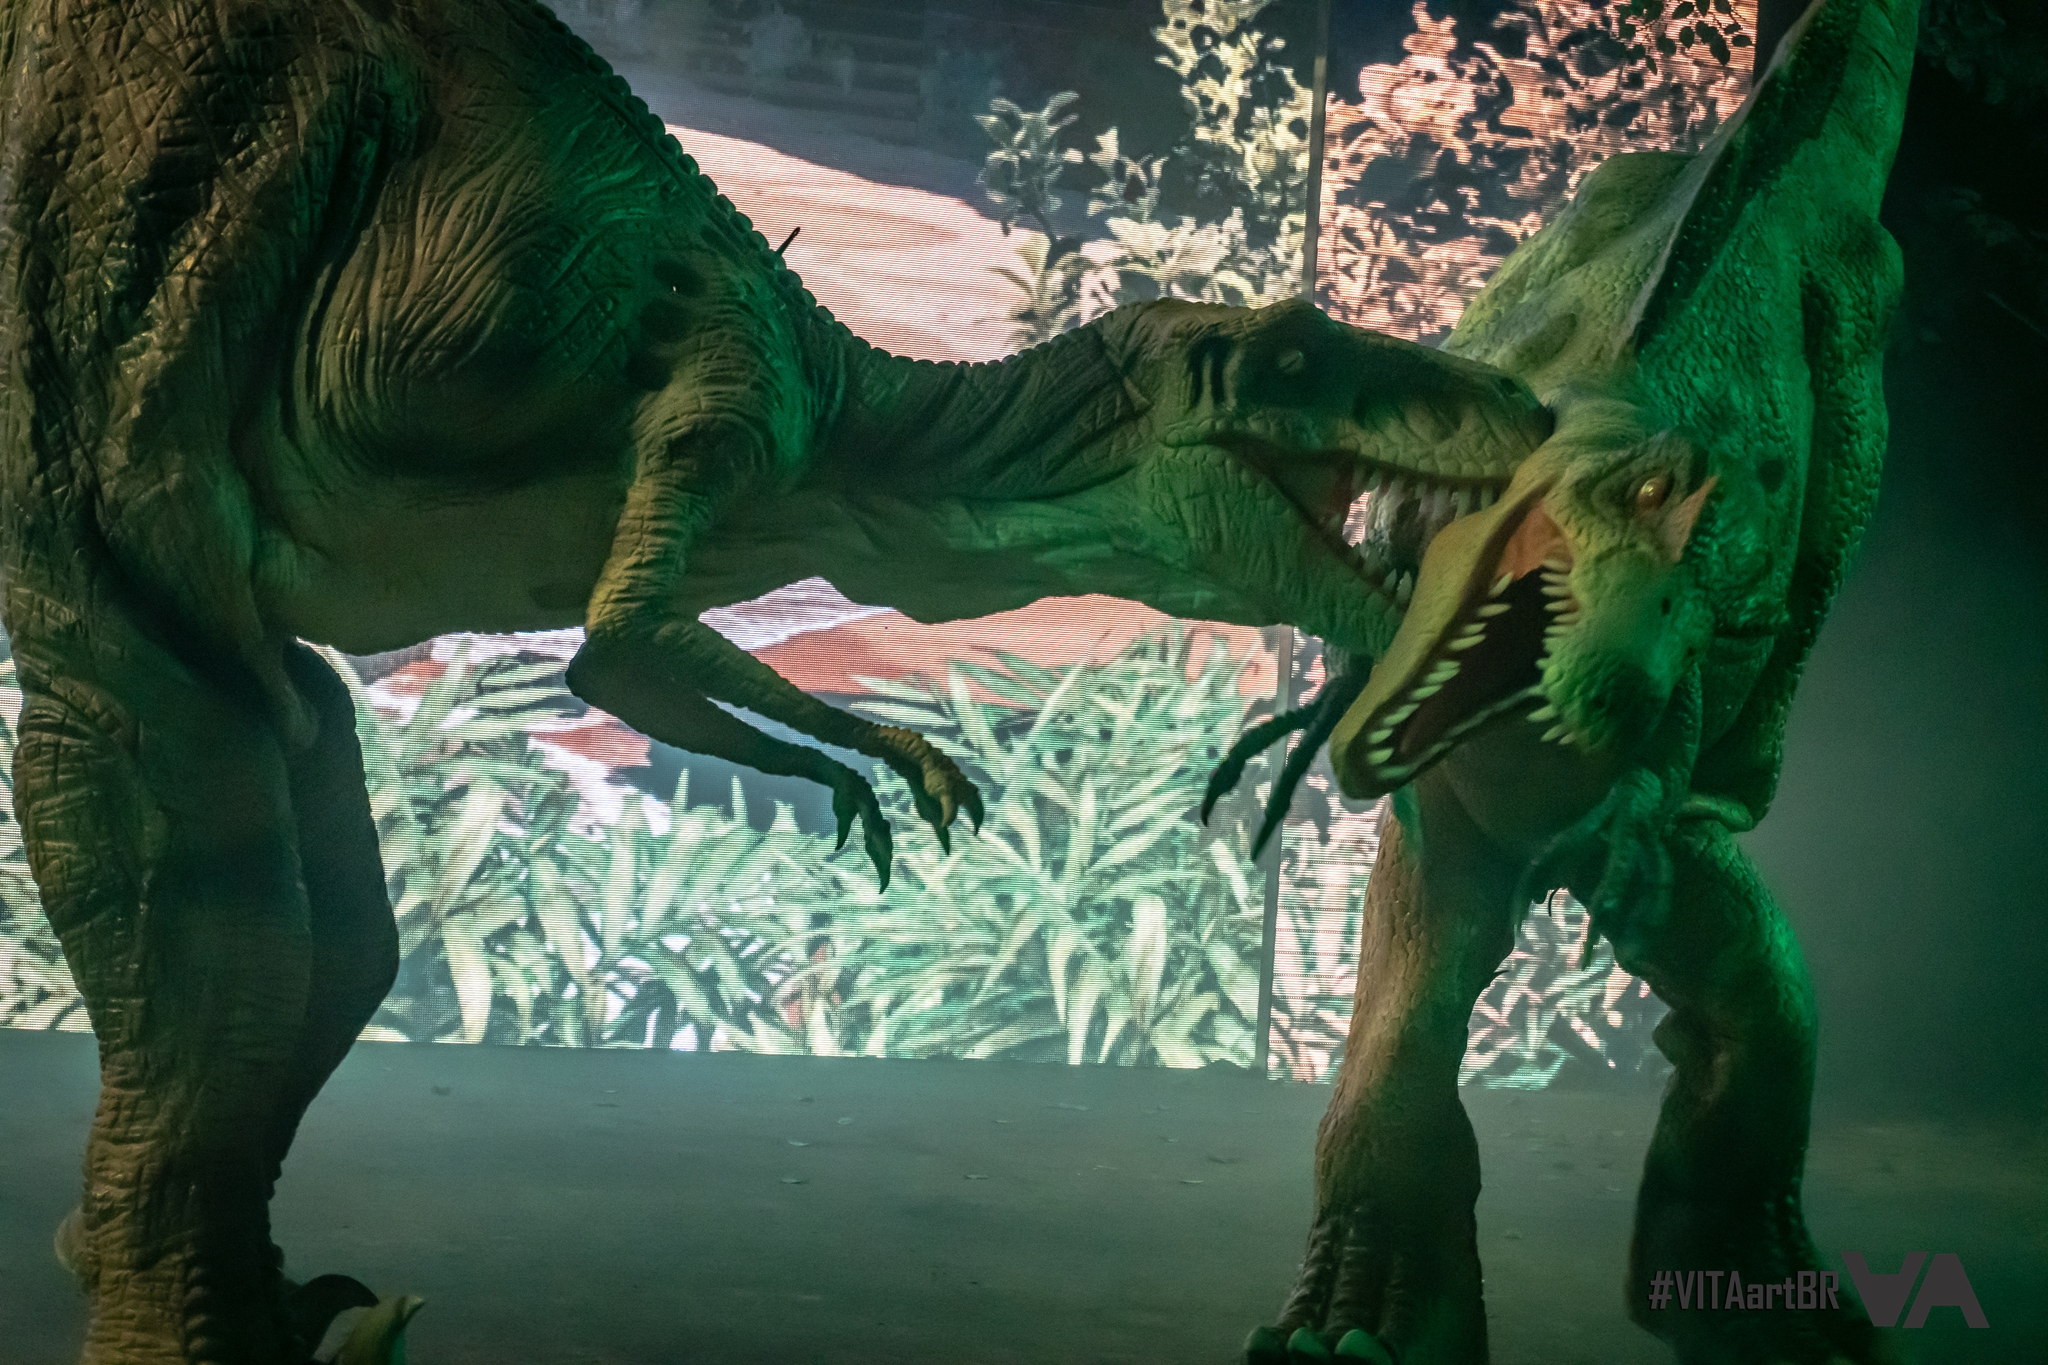 VITAartBR - DinosExperience - 42